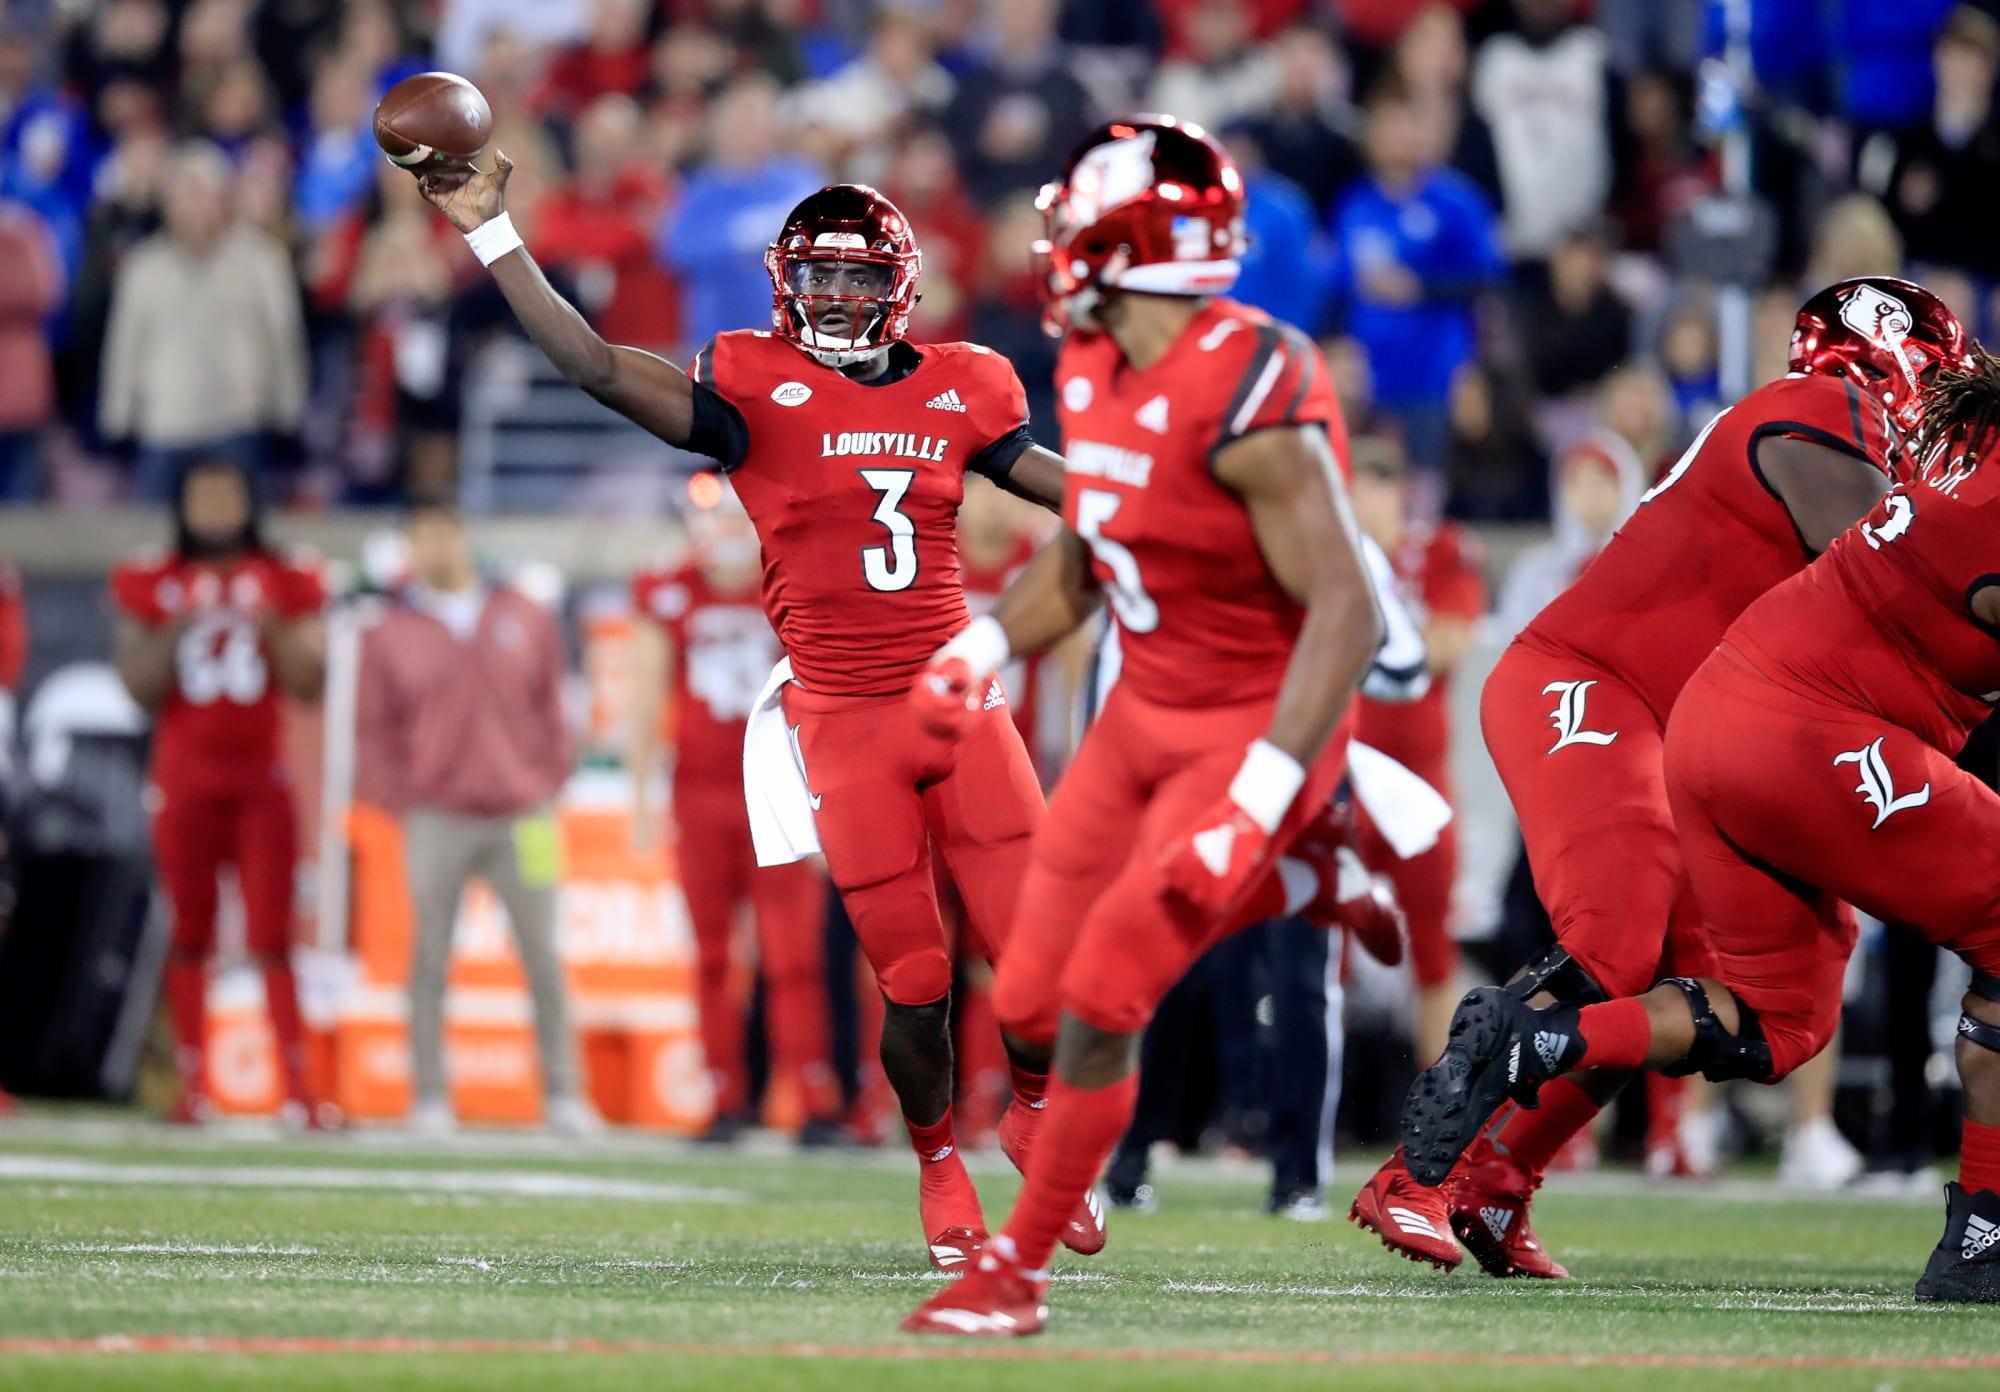 Louisville football: Three takeaways from win against WKU